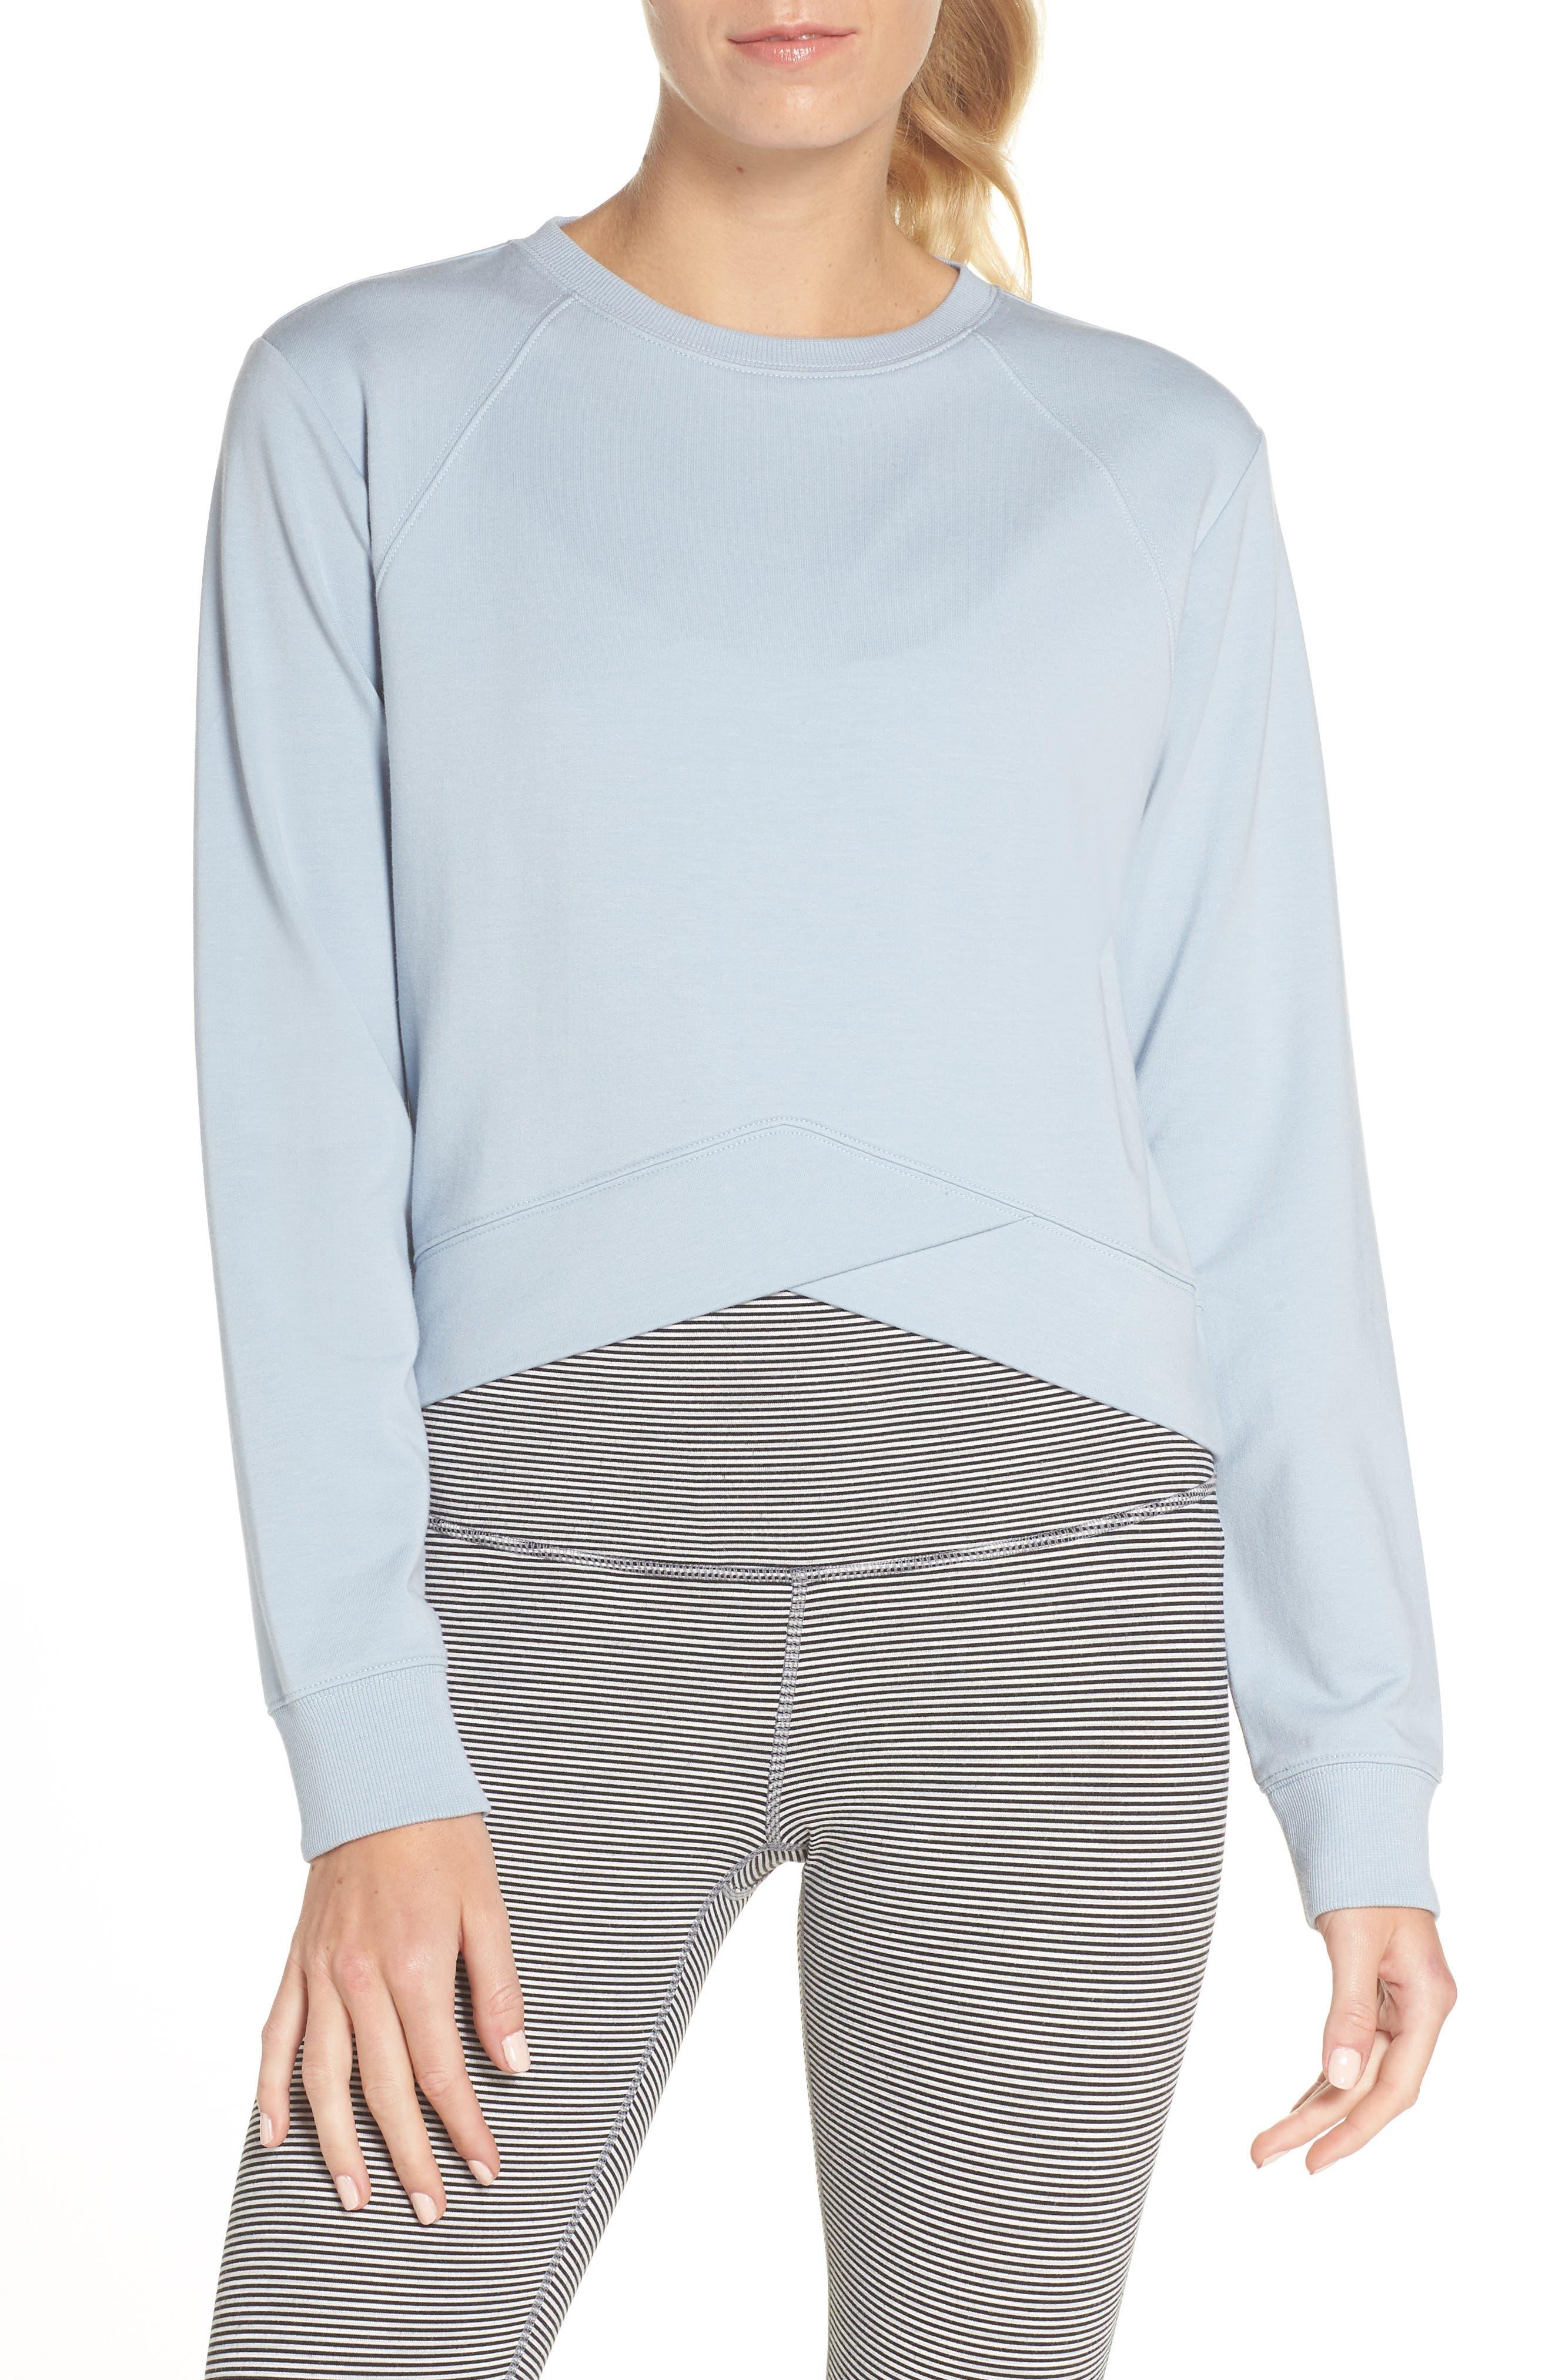 Uplifted Sweatshirt,                         Main,                         color, 420